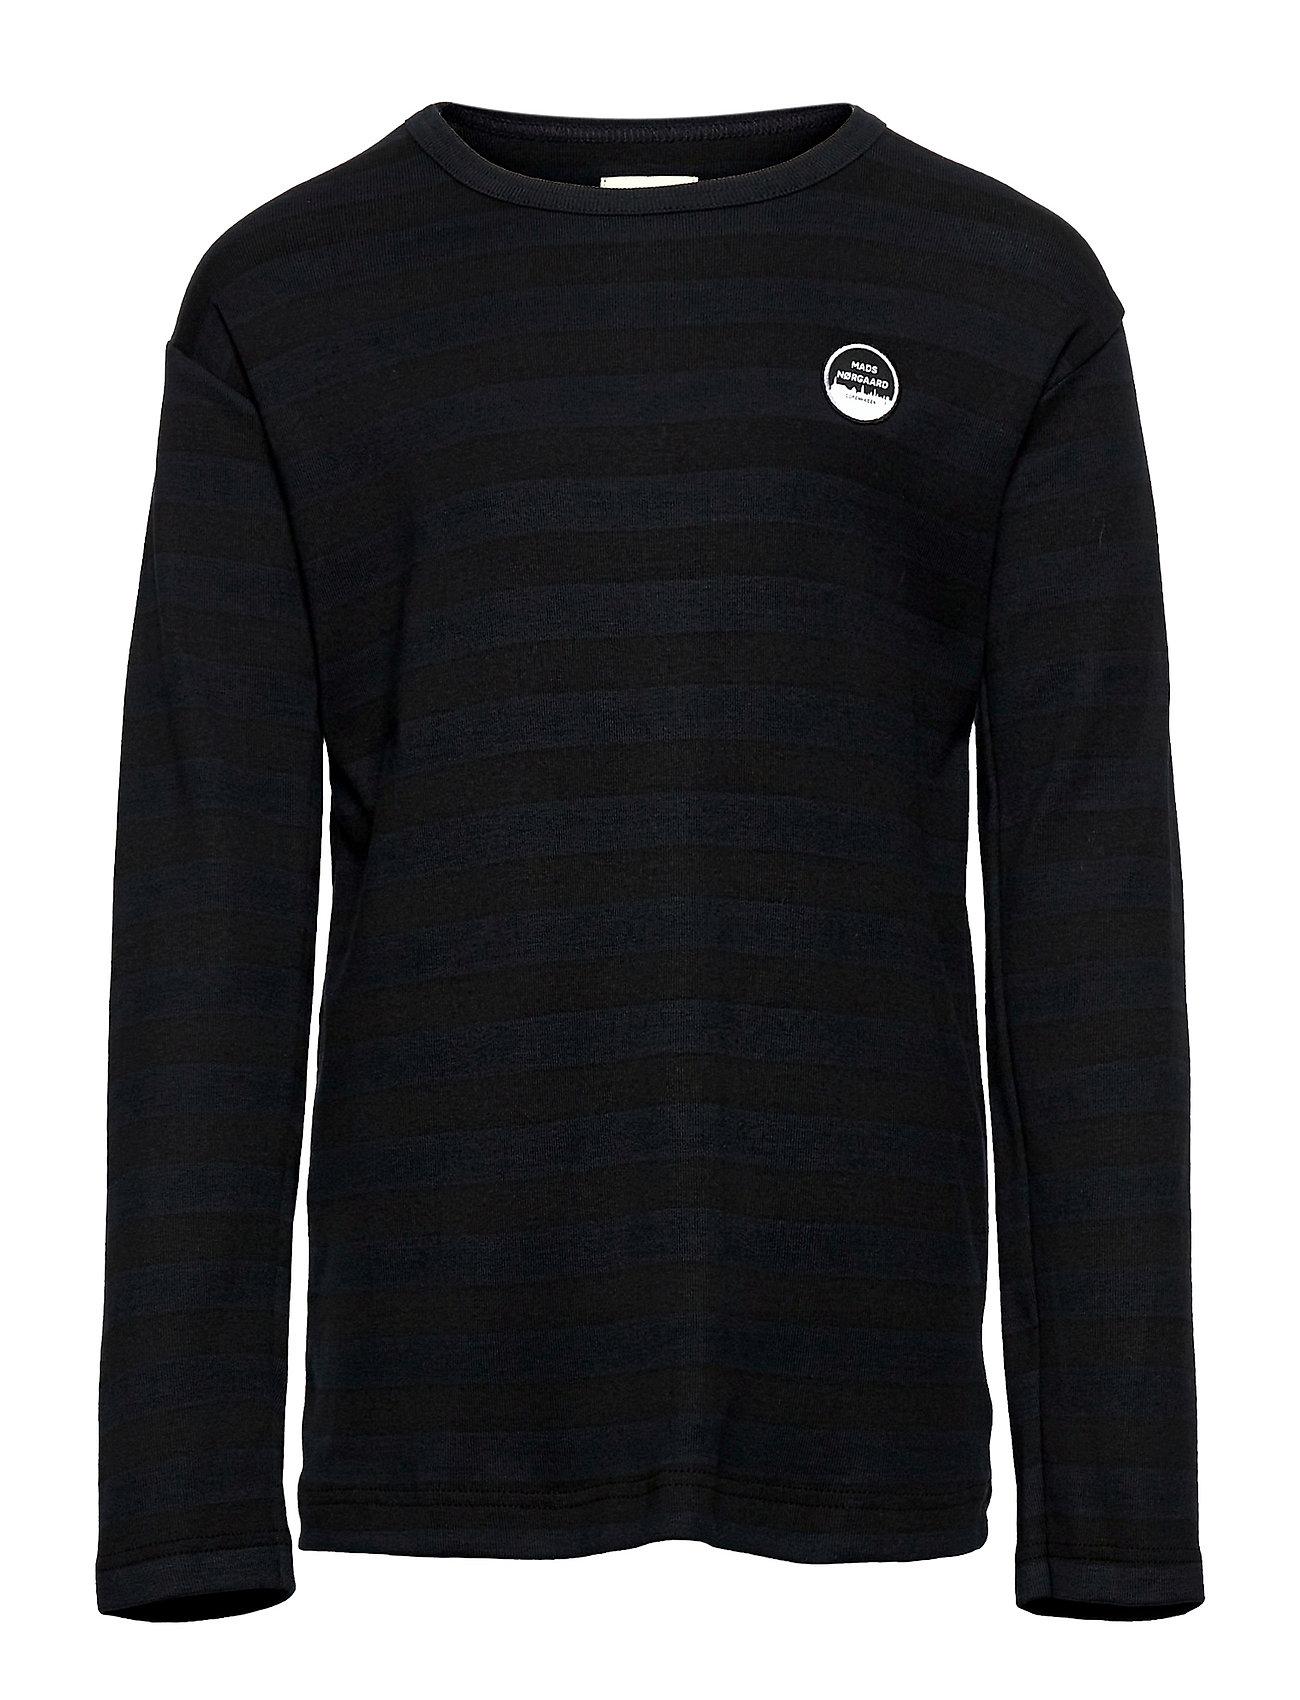 Midi Rib Tobino Long Langærmet T-shirt Sort Mads Nørgaard